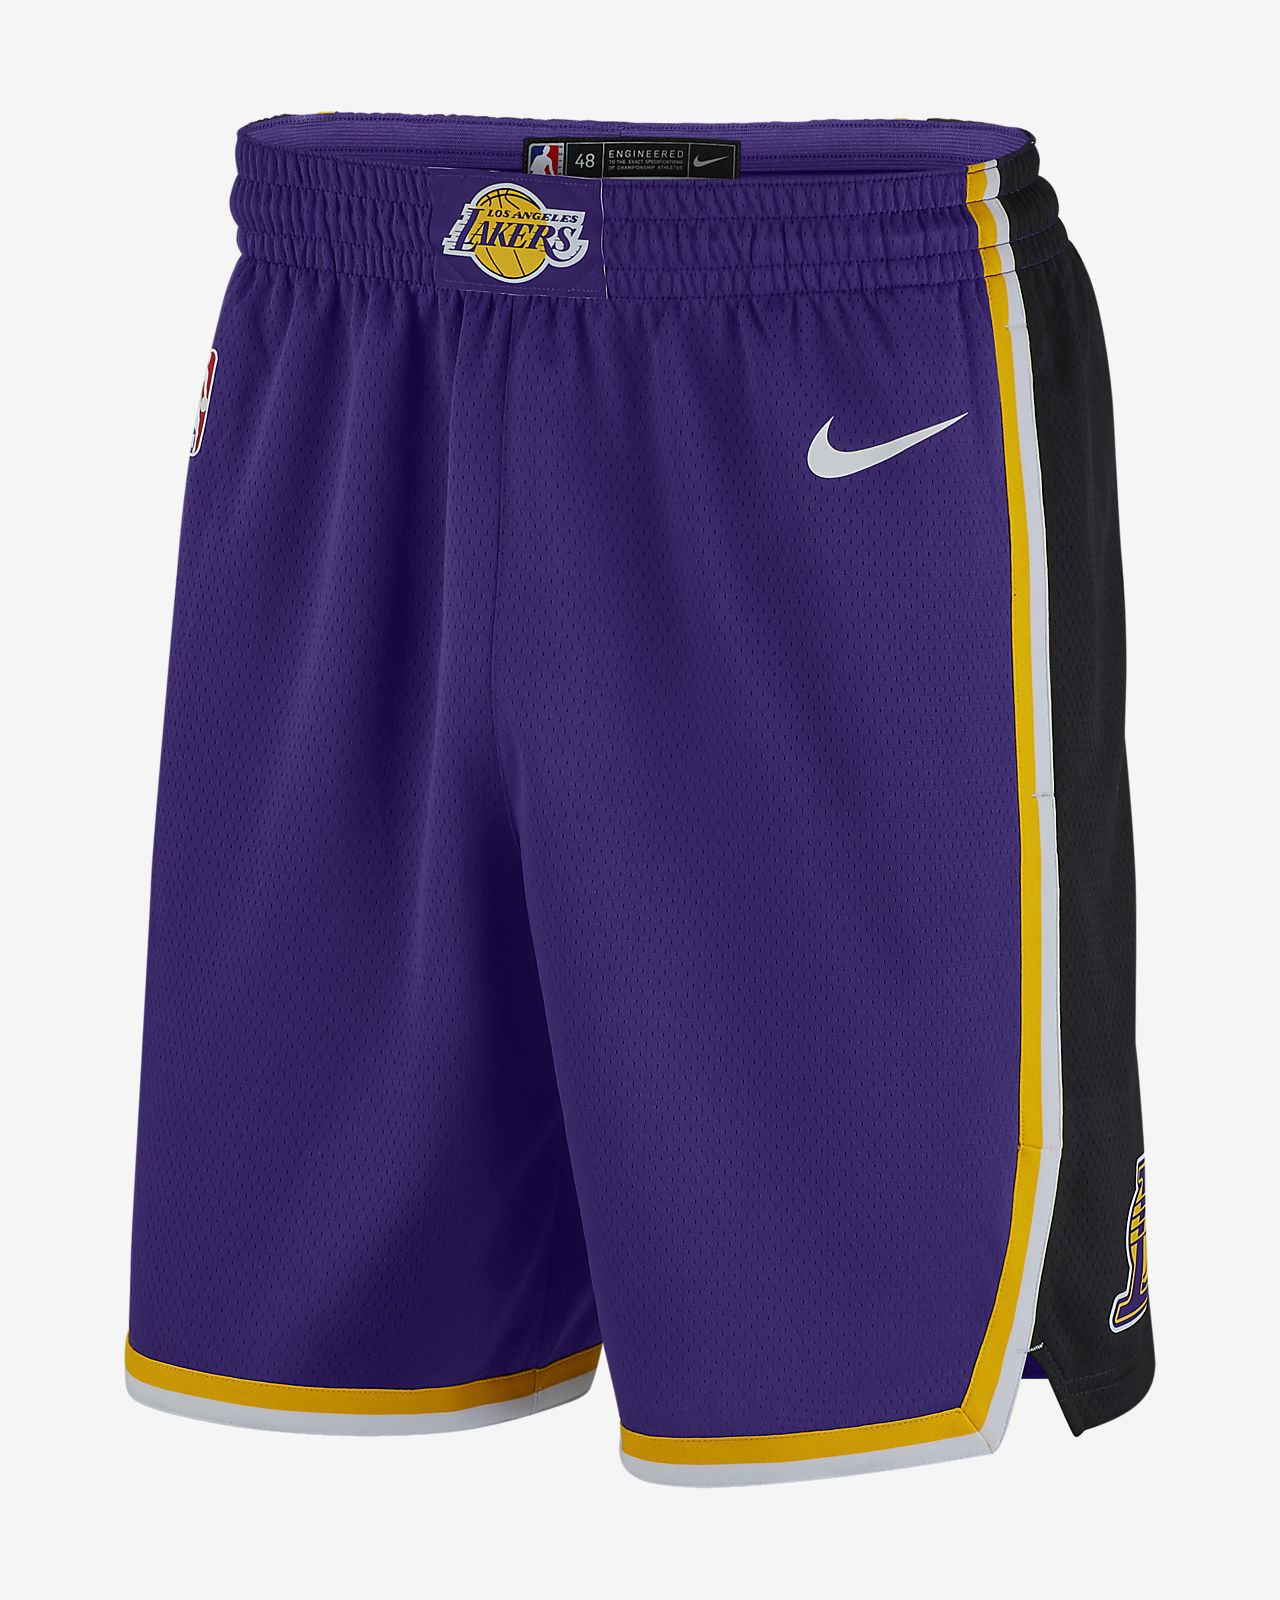 Short Nike NBA Los Angeles Lakers Statement Edition Swingman pour Homme